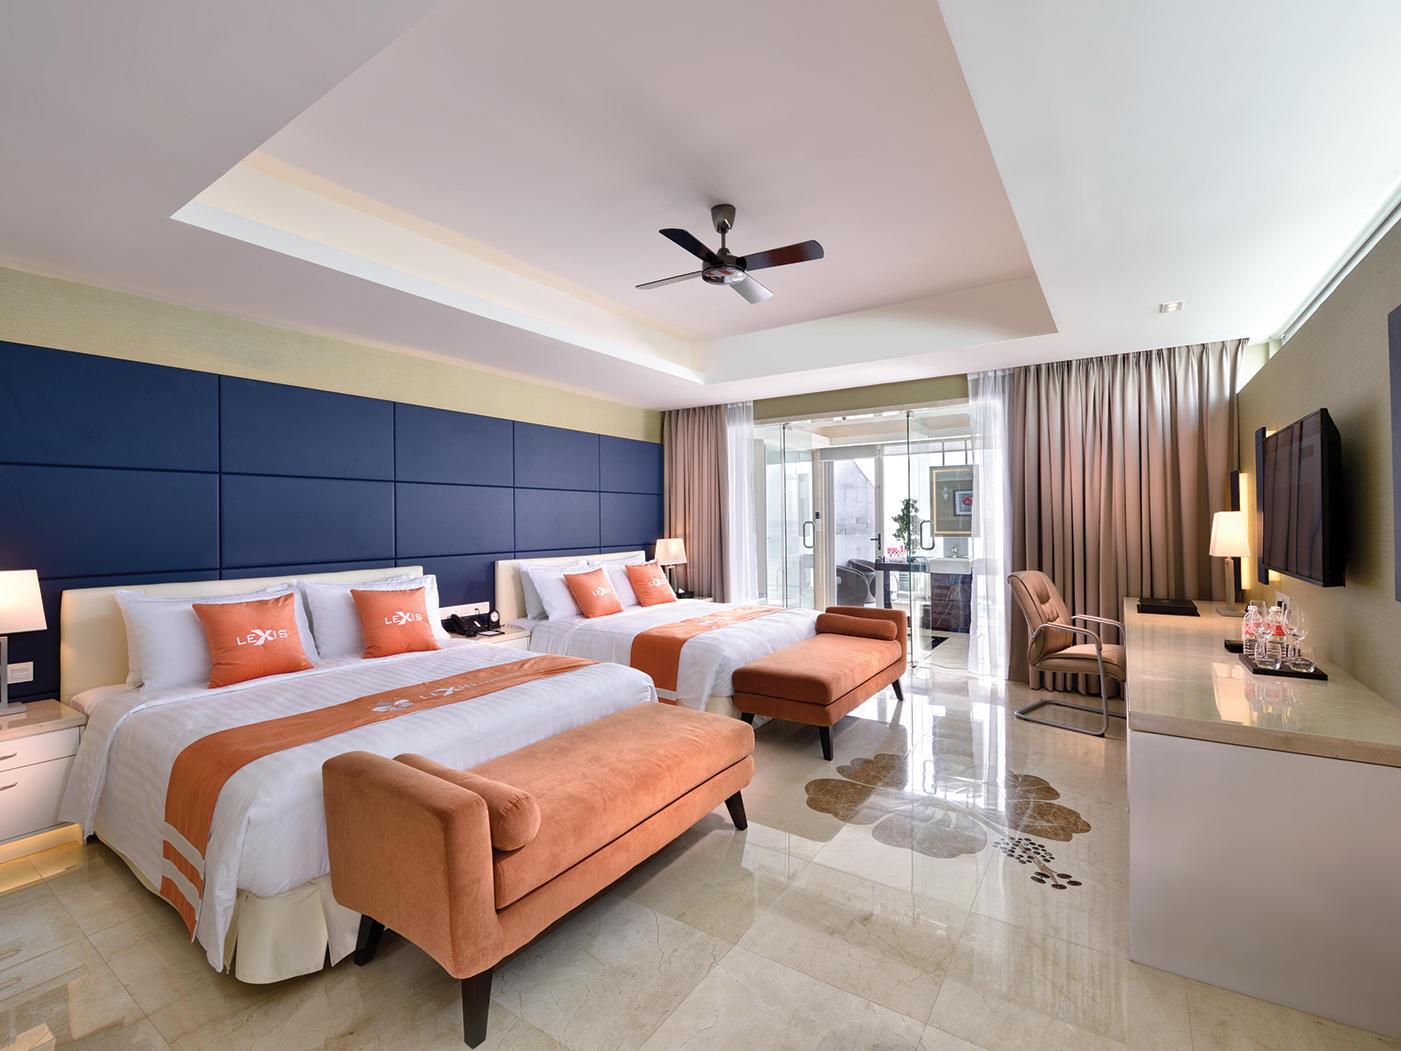 هتل لکسیس سوییتز پنانگ